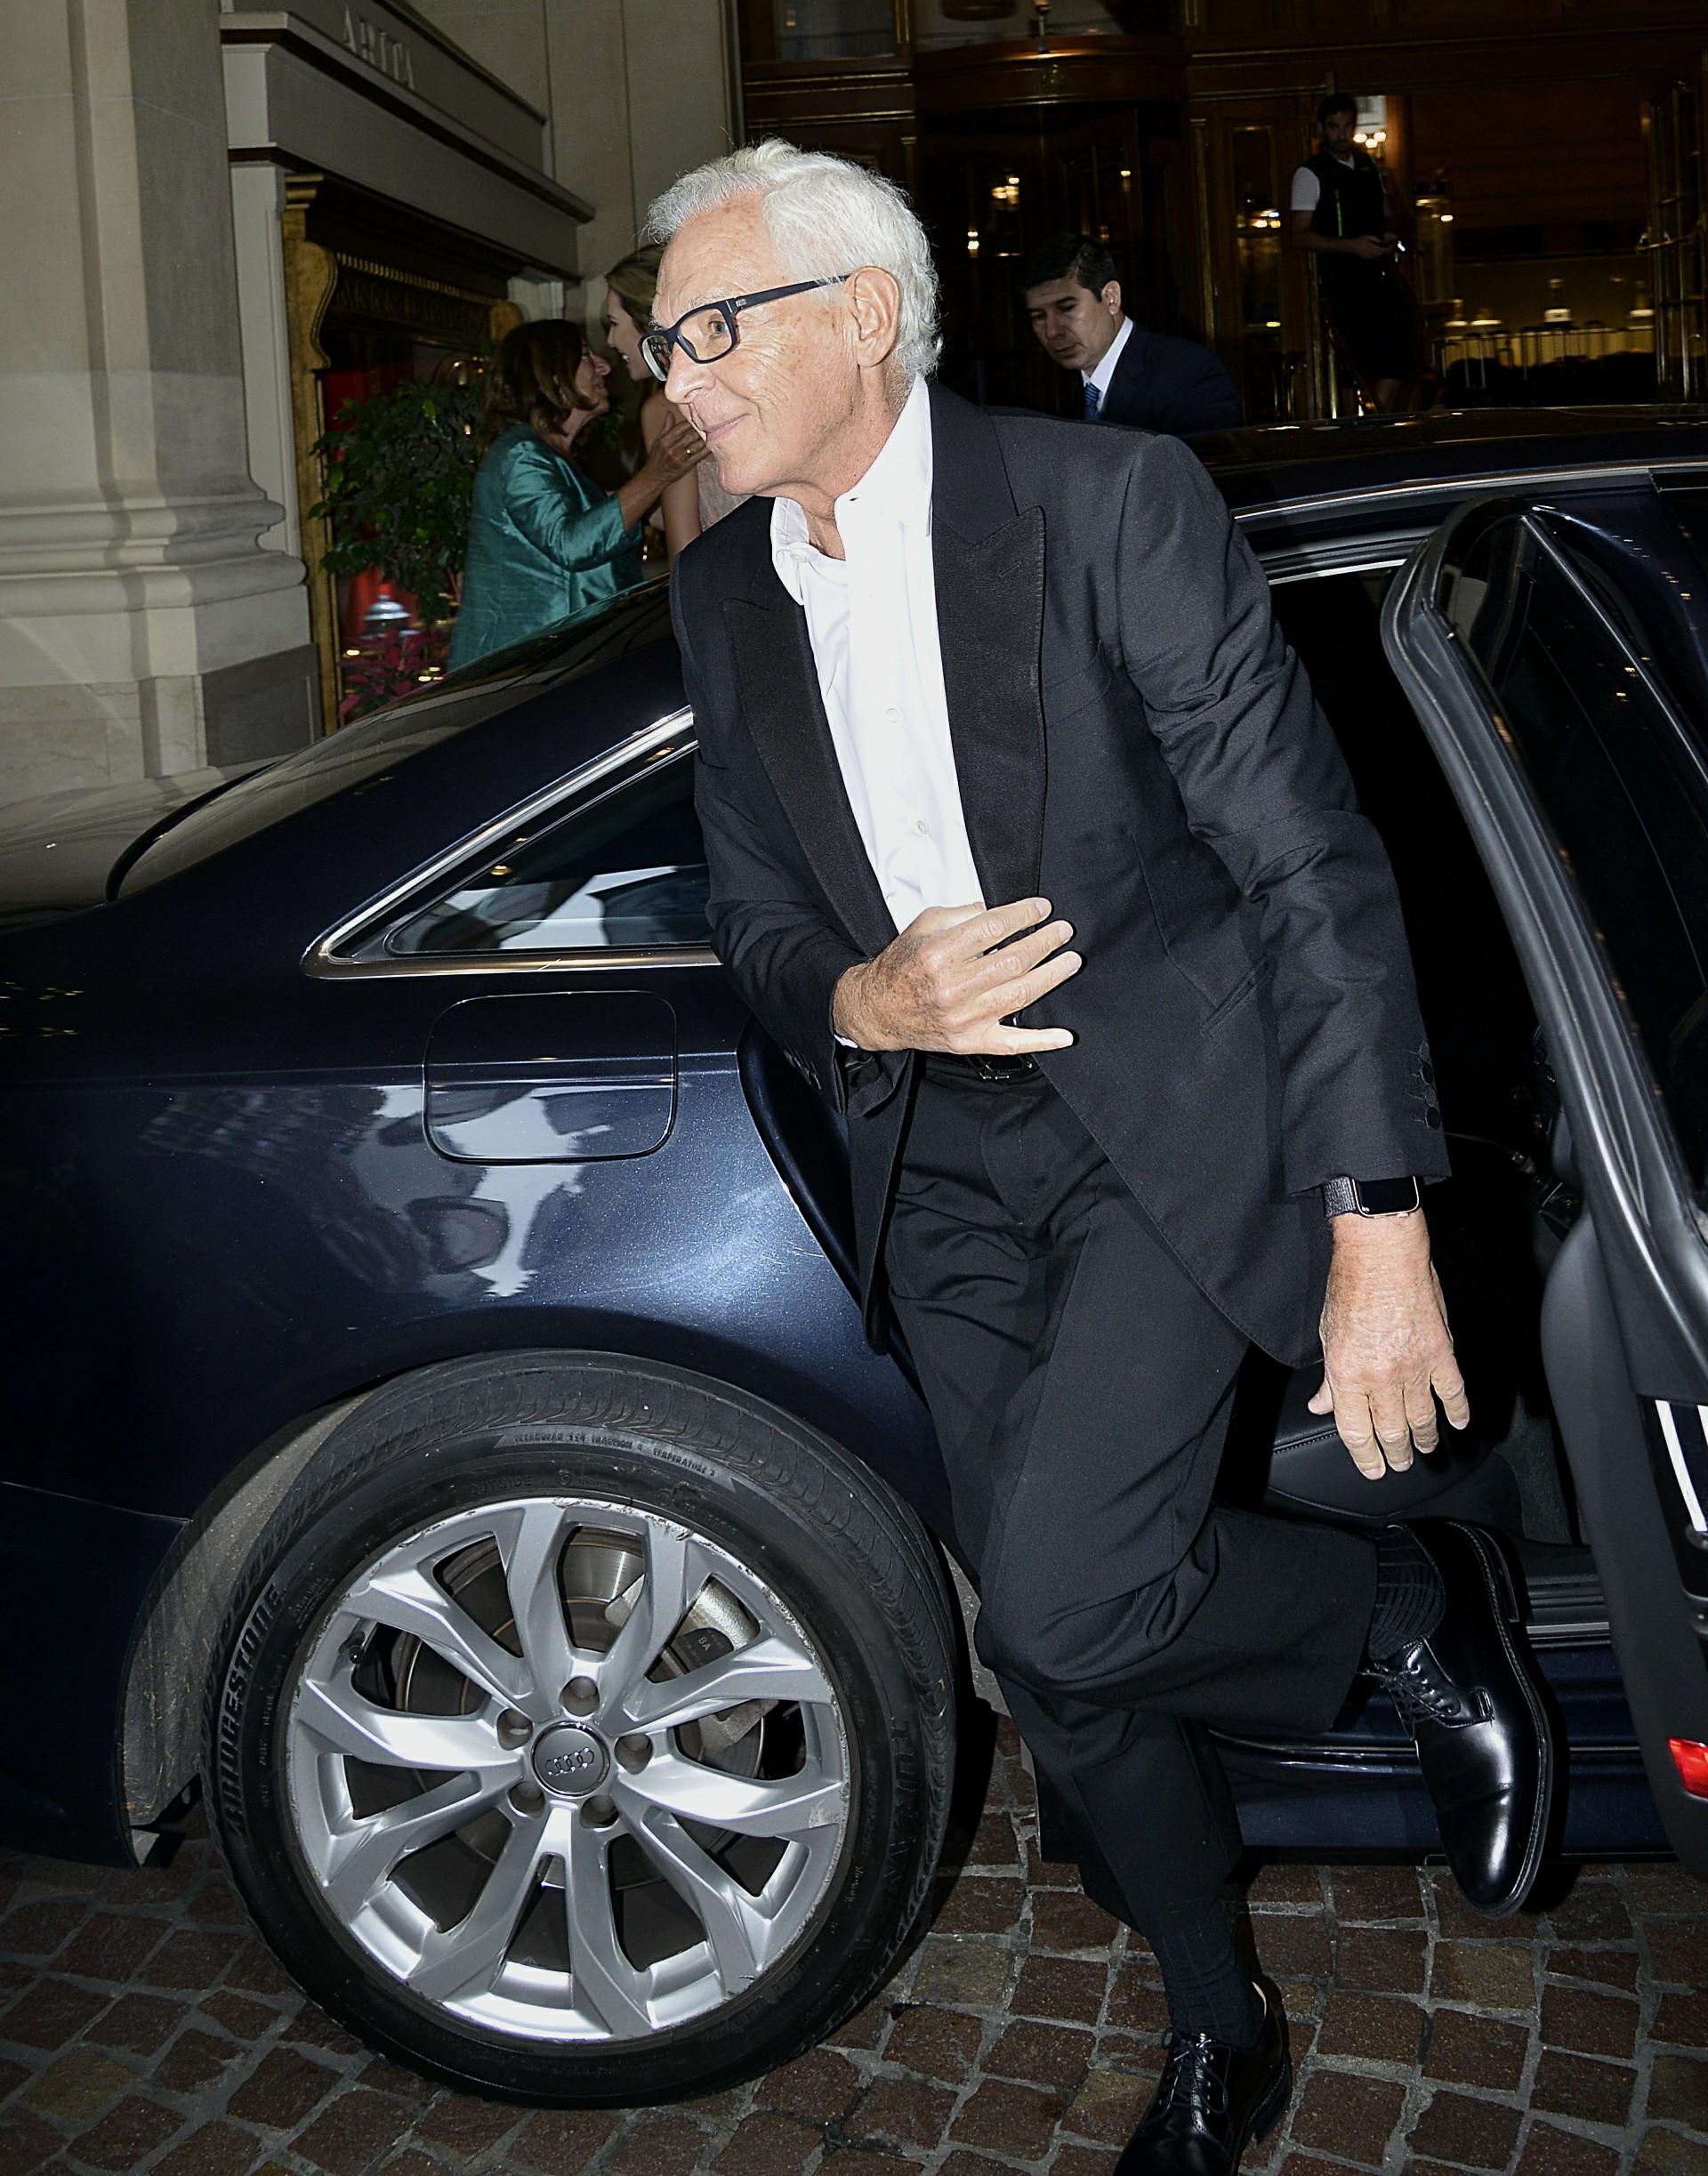 La llegada del empresario Eduardo Costantini